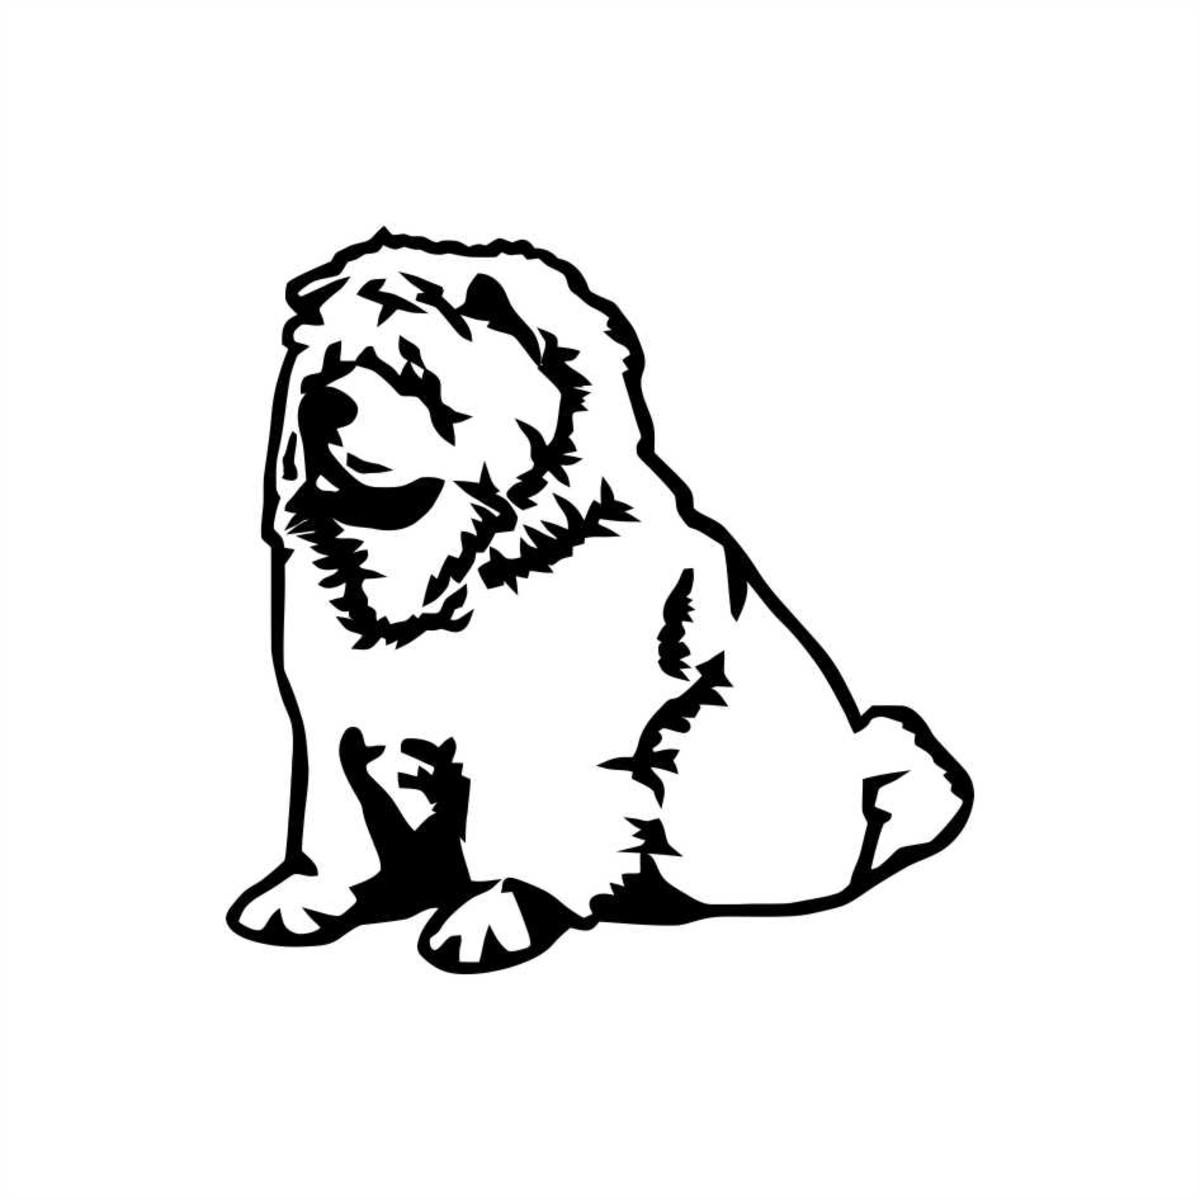 Adesivo Pet Cachorro Chow Chow 10x10cm No Elo7 Queen Industria